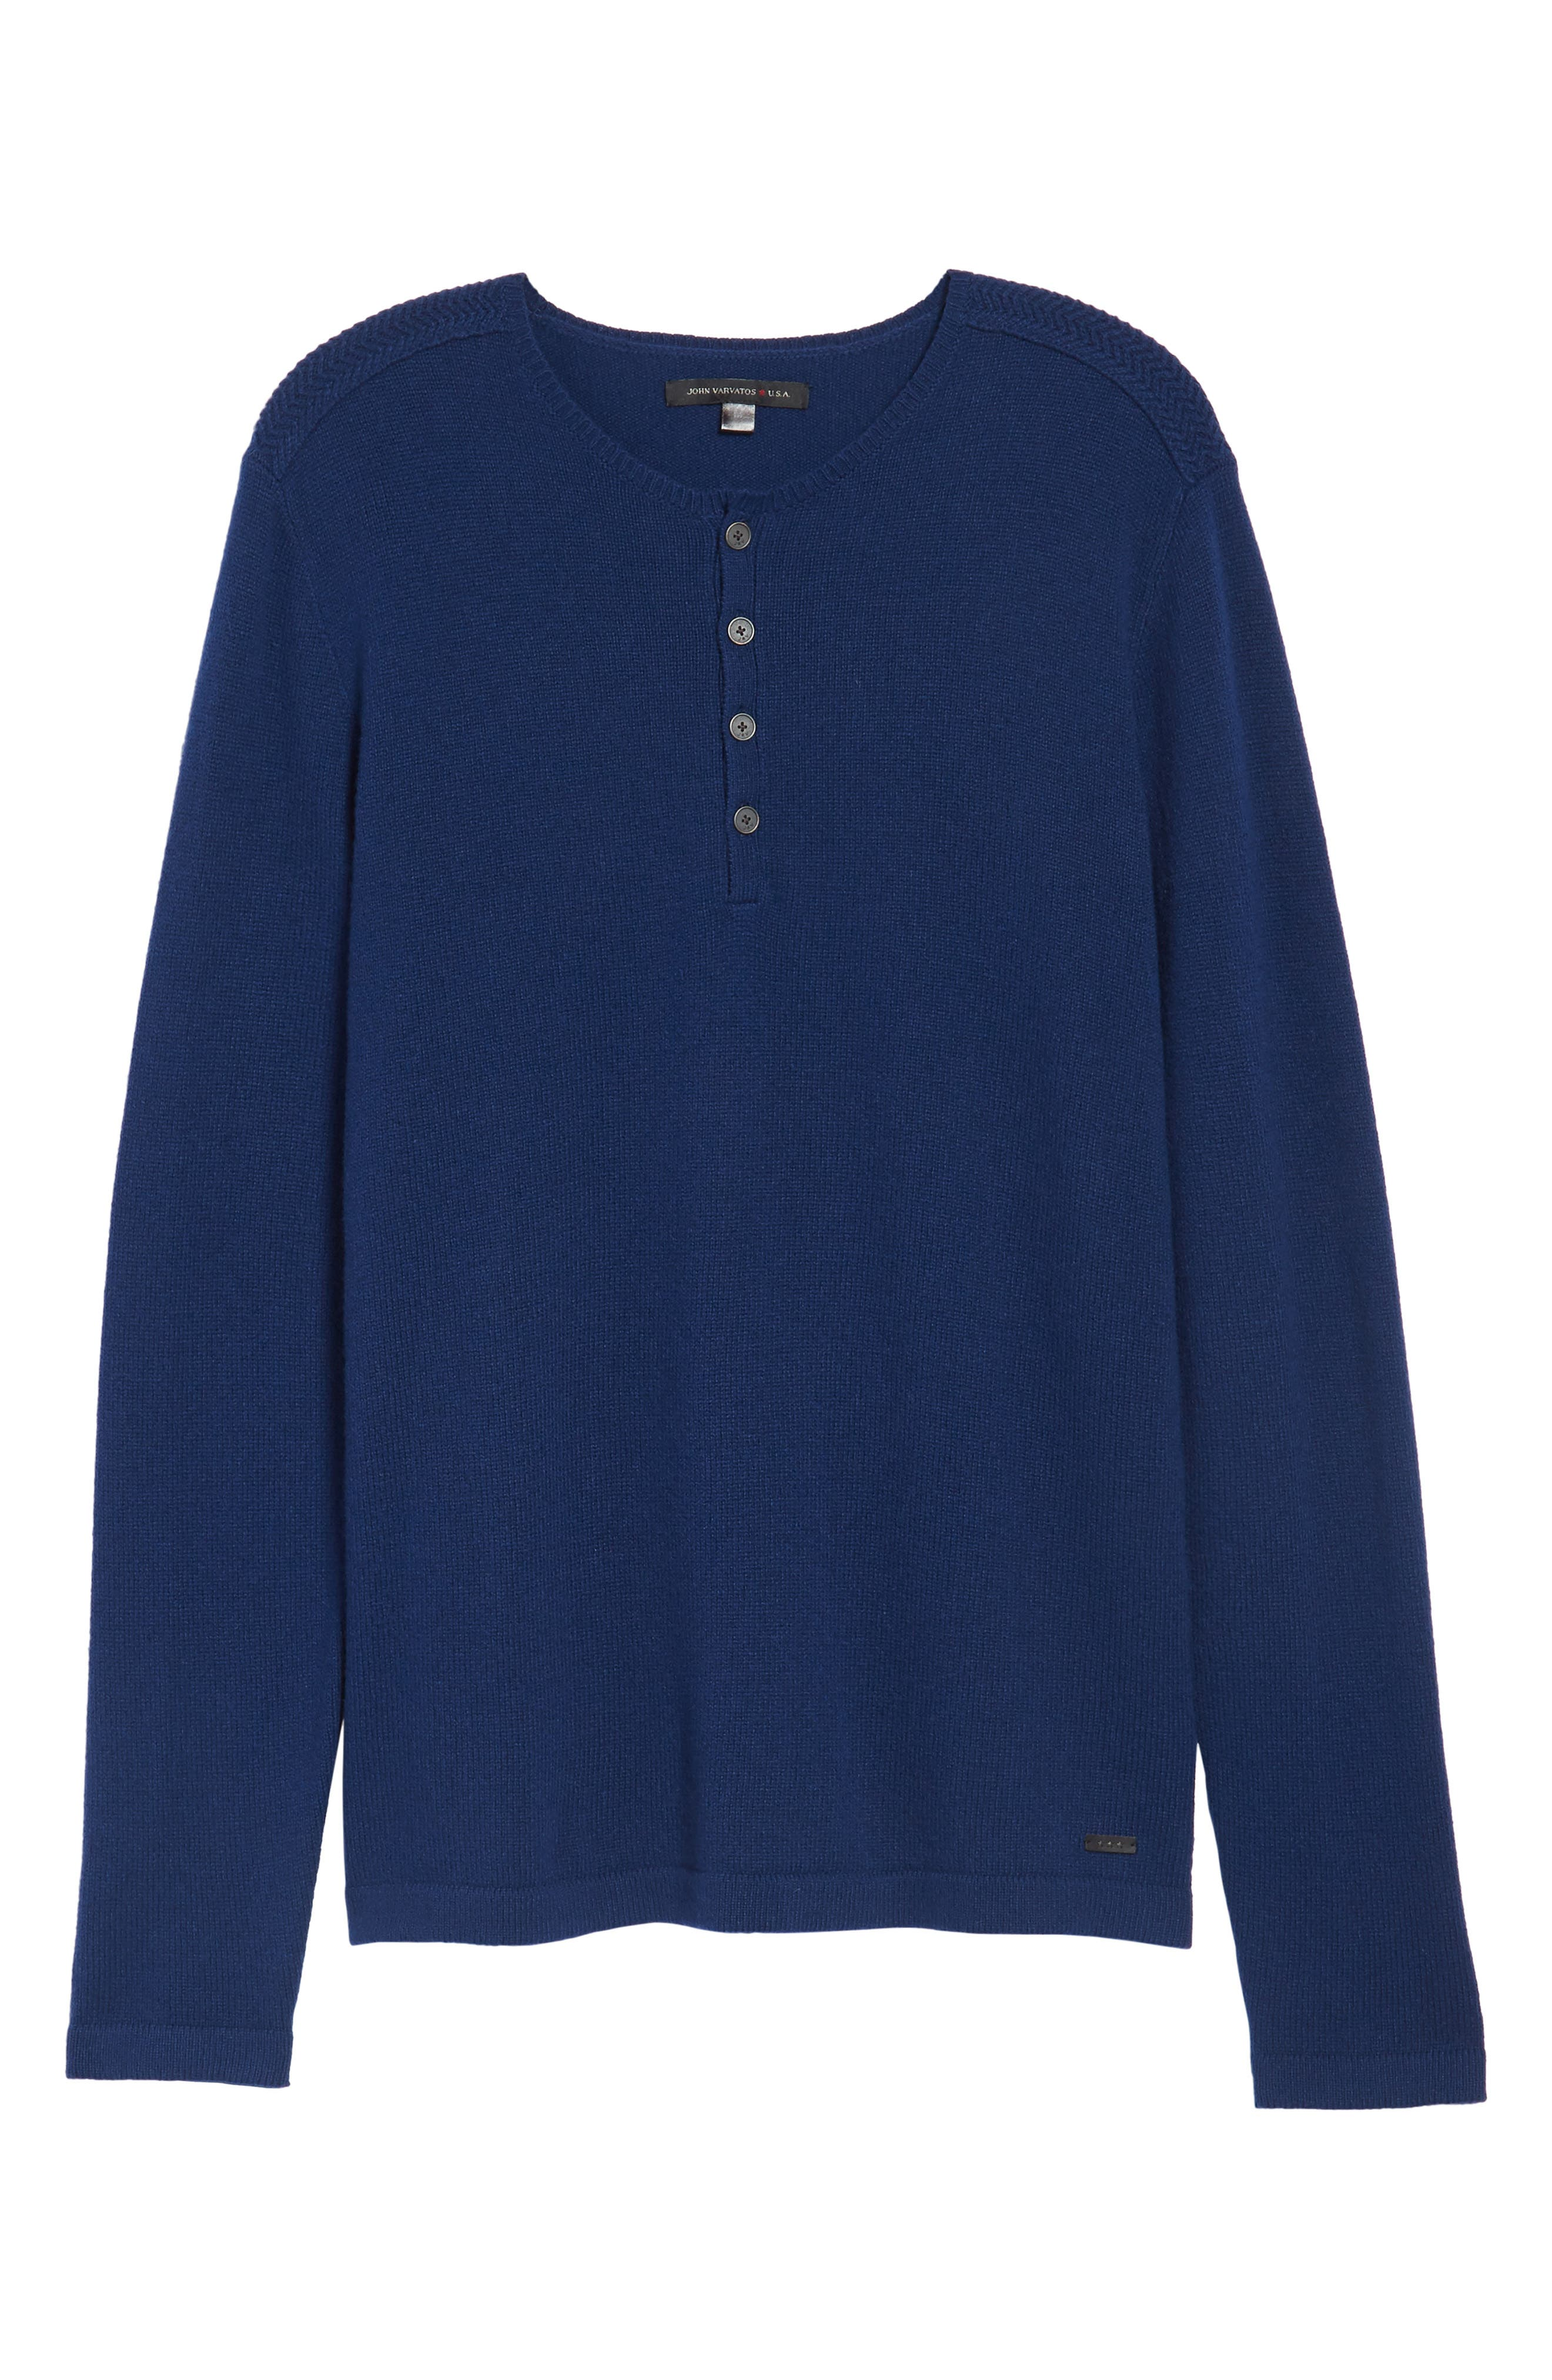 Henley Sweater,                             Alternate thumbnail 6, color,                             Atlantic Blue